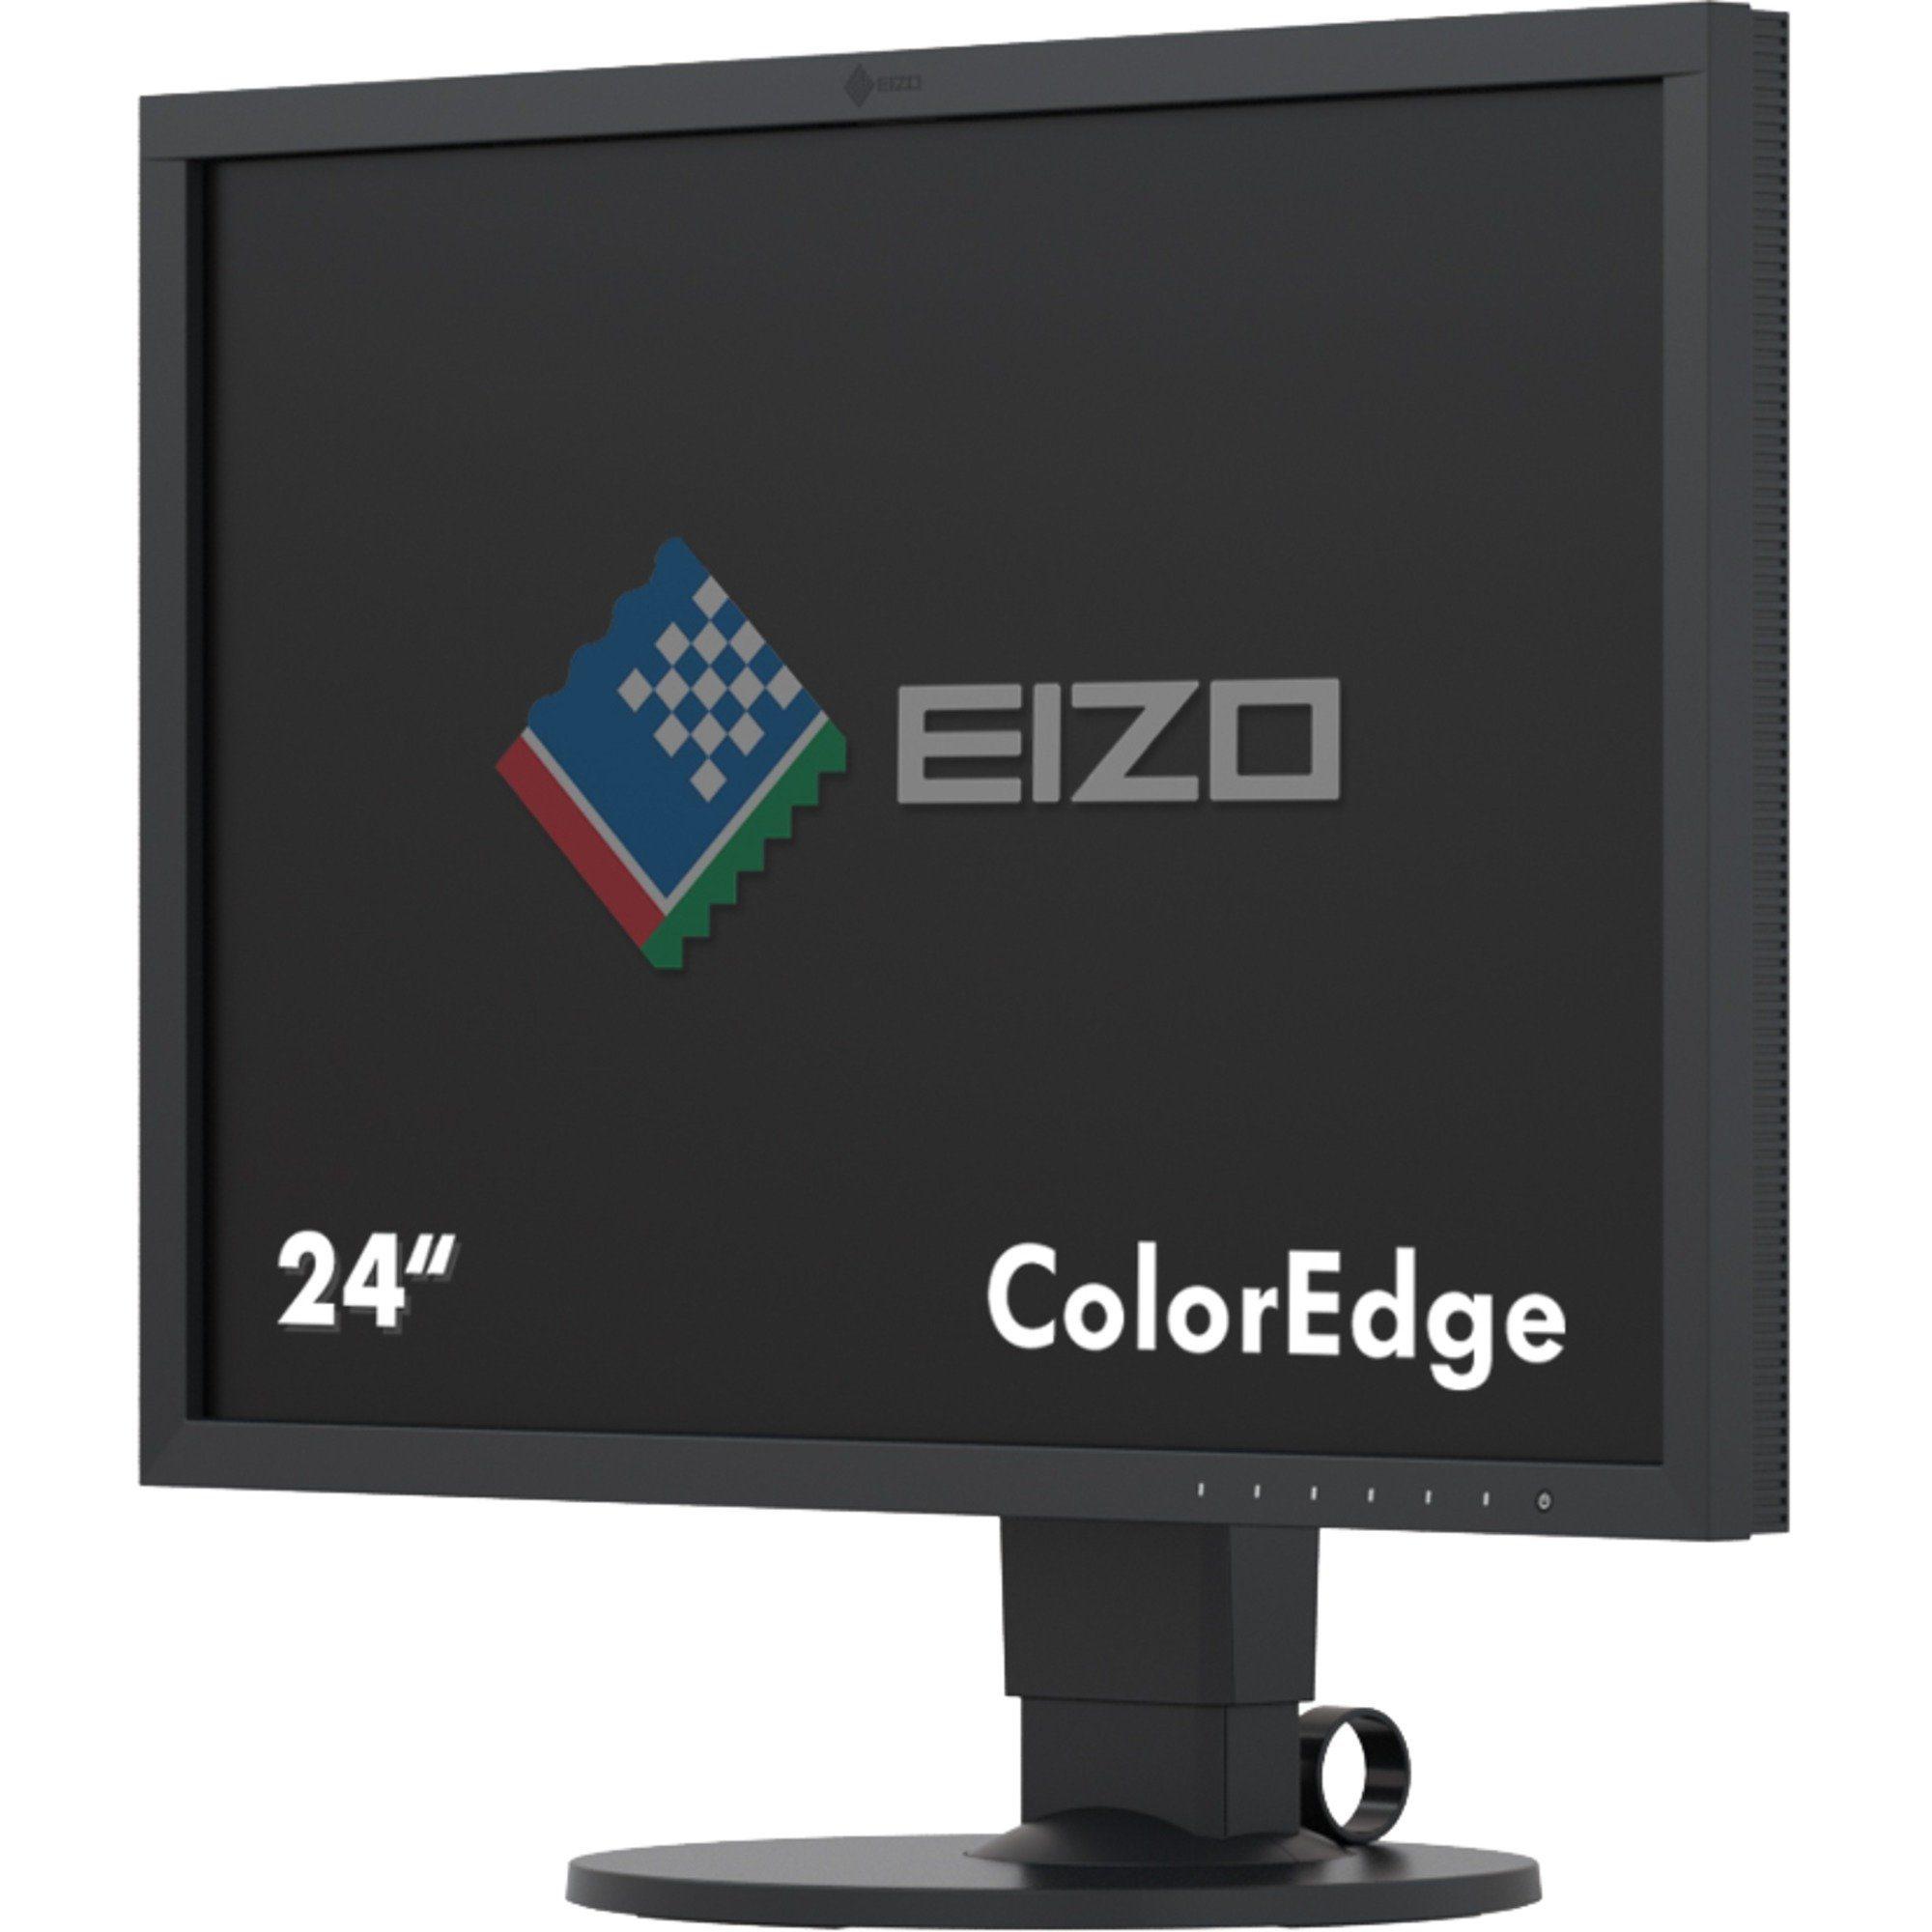 Eizo LED-Monitor »CS2420 ColorEdge«